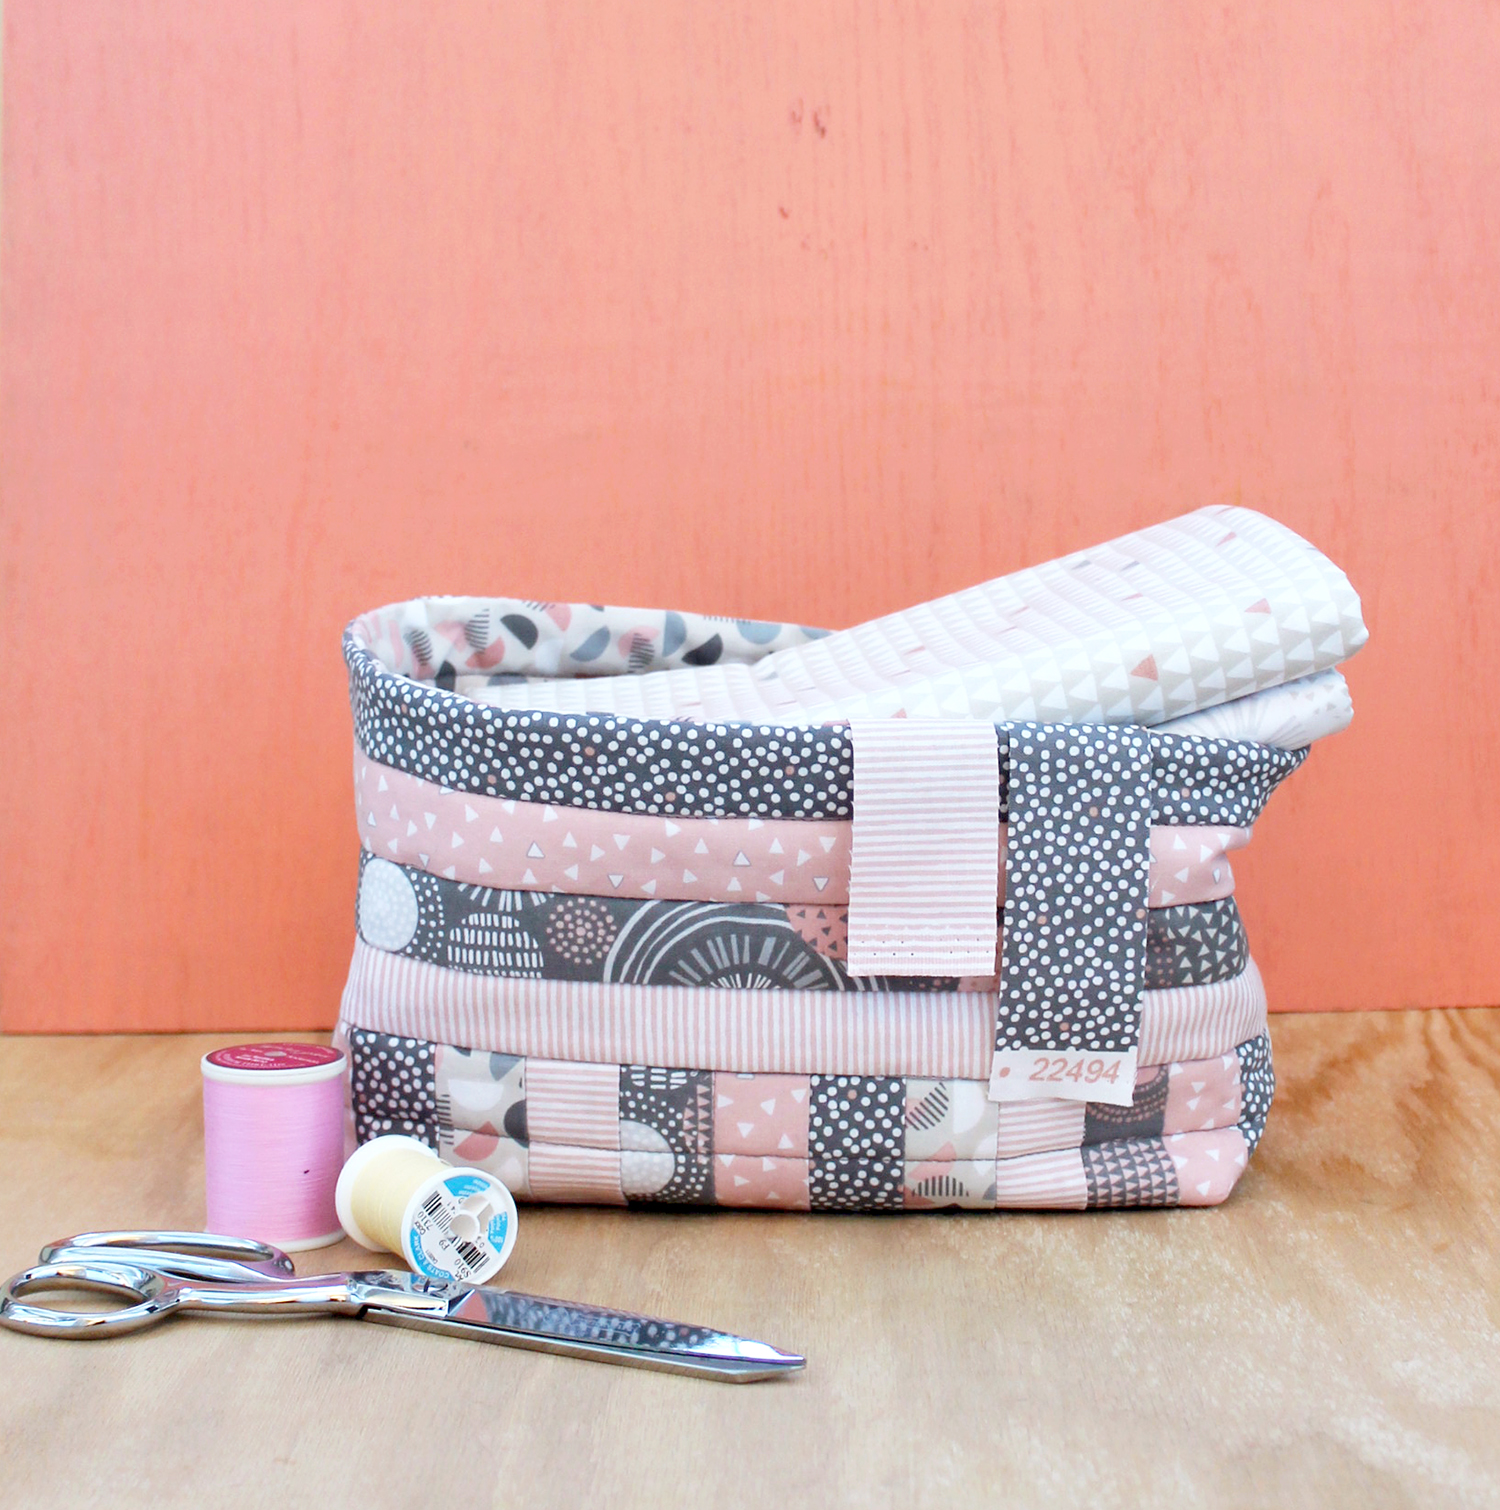 fabric_bin_new.jpg